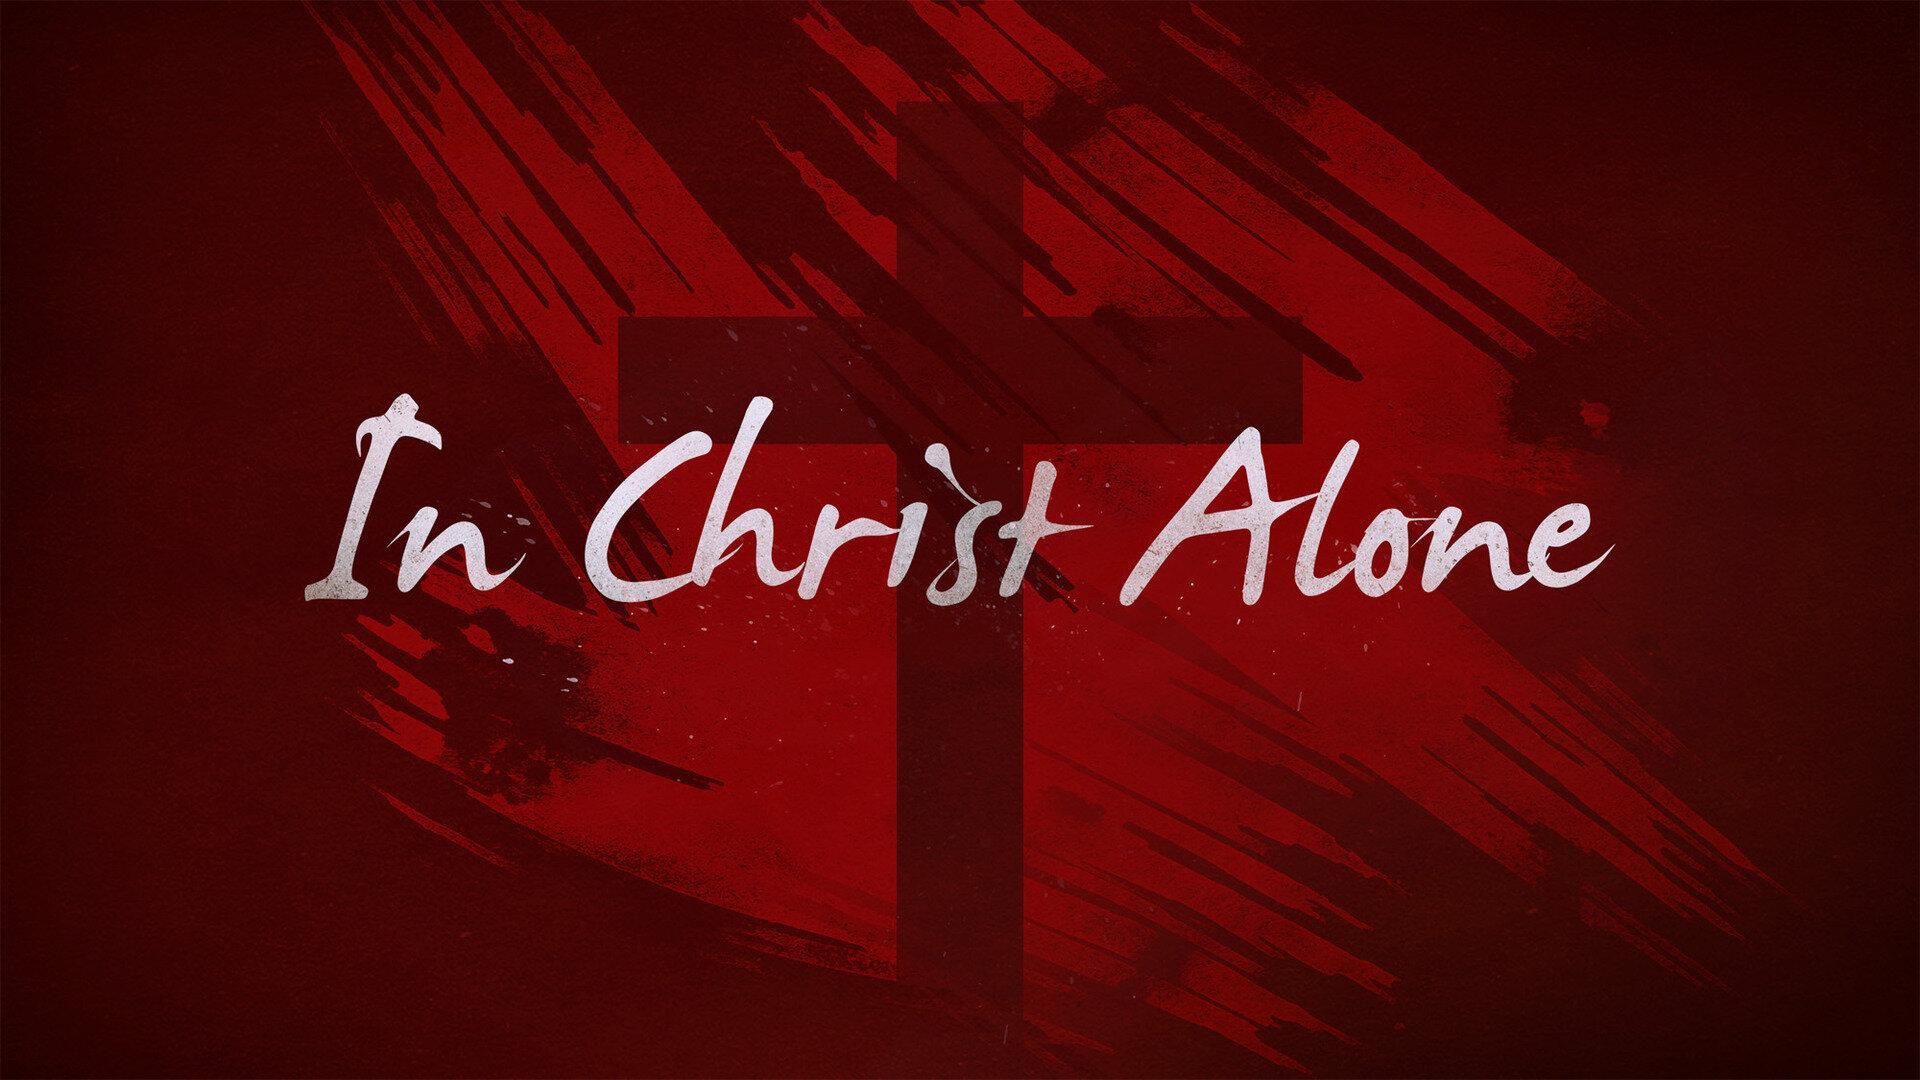 in_christ_alone-title-2-still-16x9.jpg